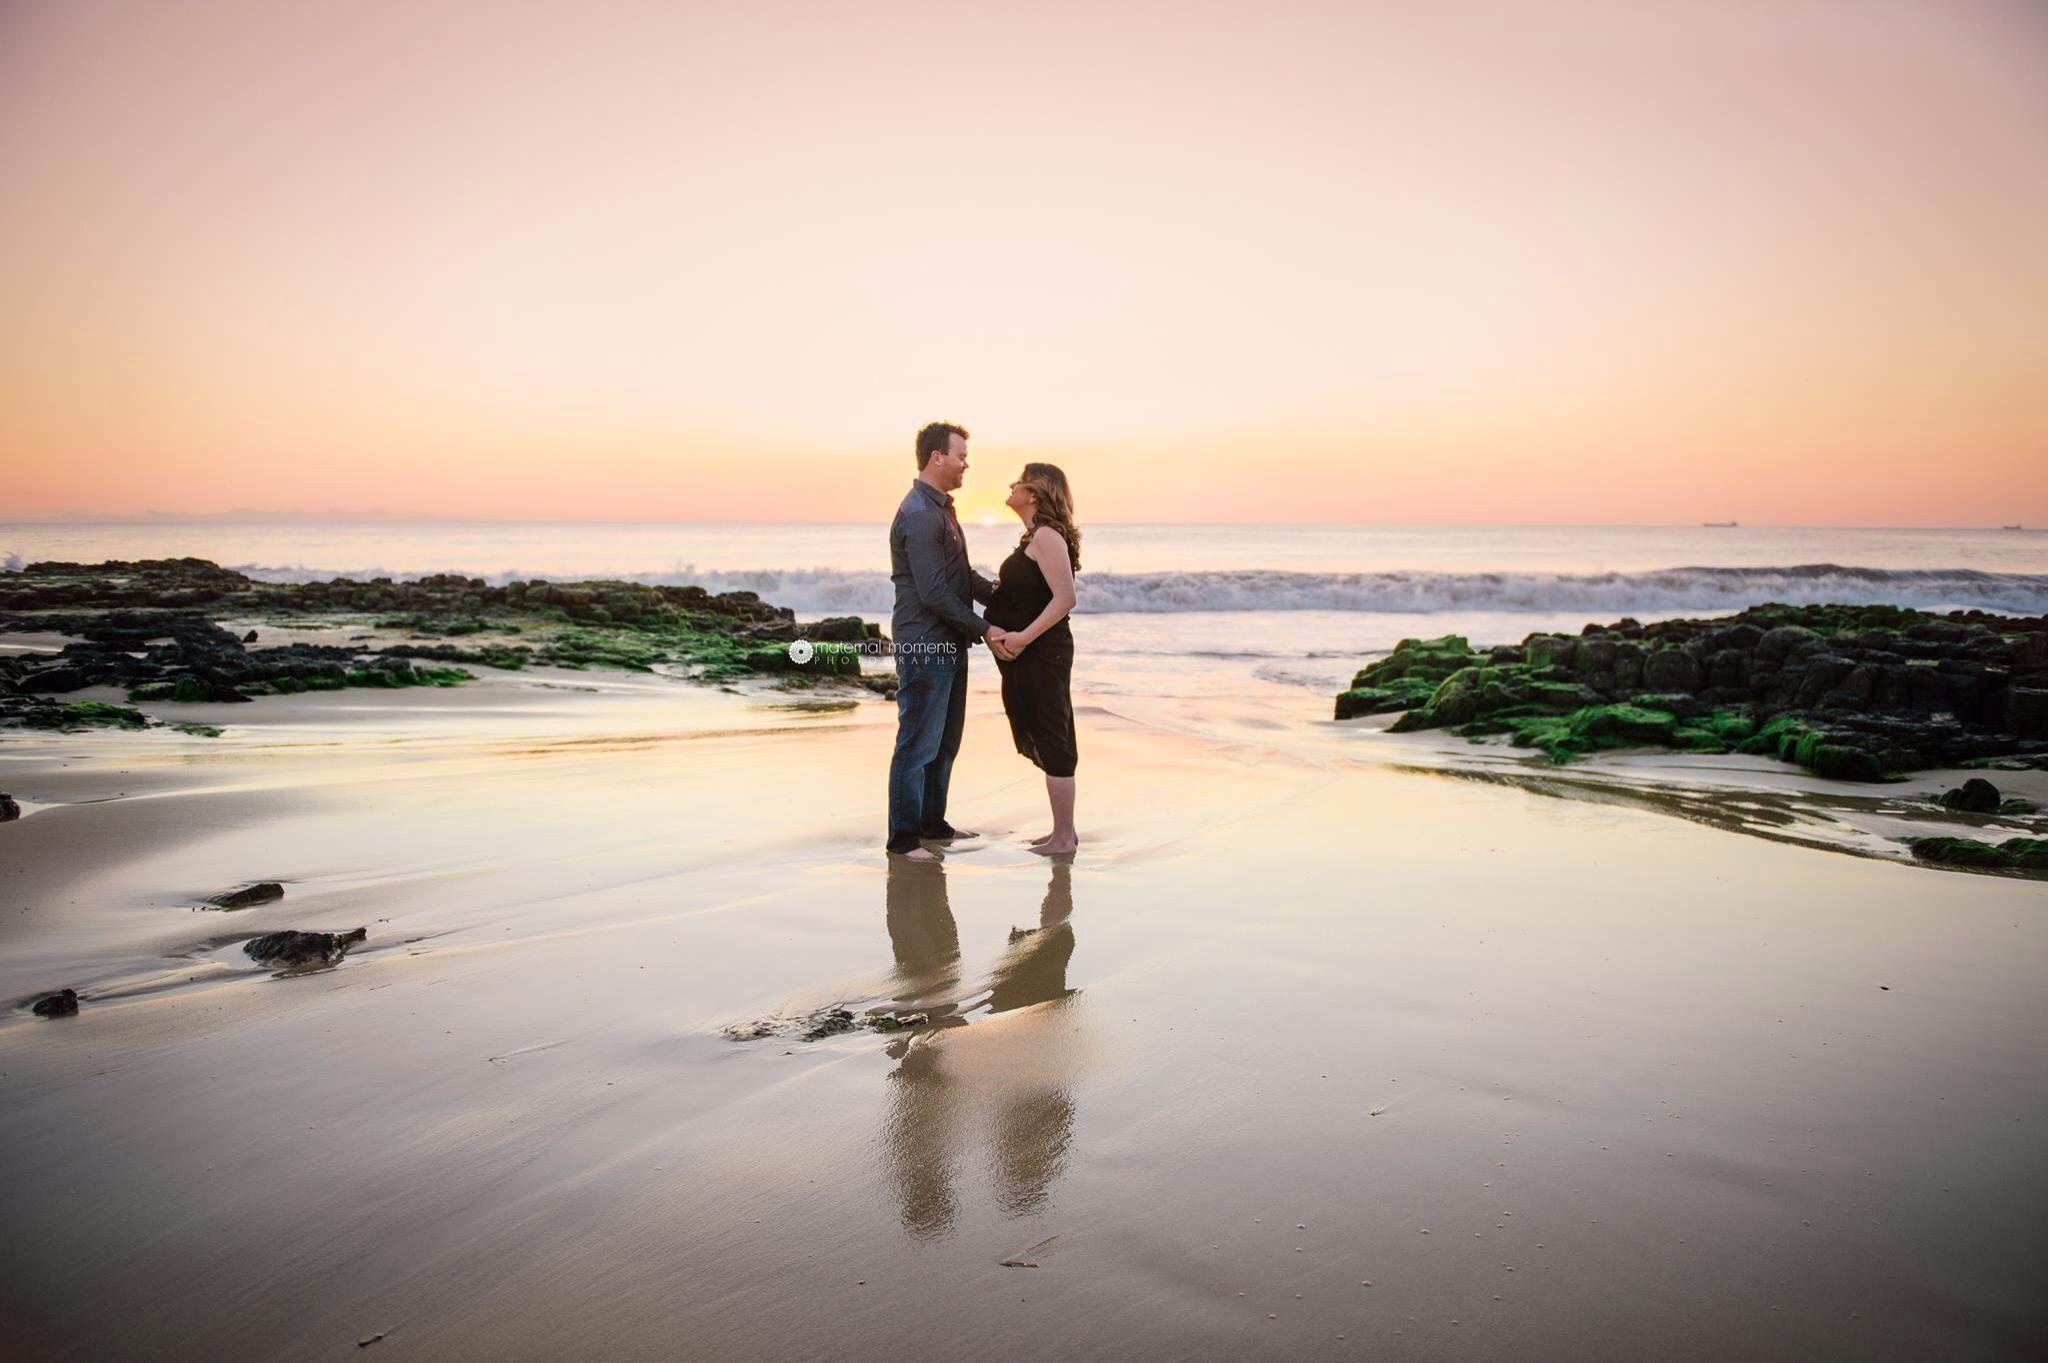 Siobhan and Angus at 35 weeks. Beautiful sunset on the coast of Bunbury, Southwest.